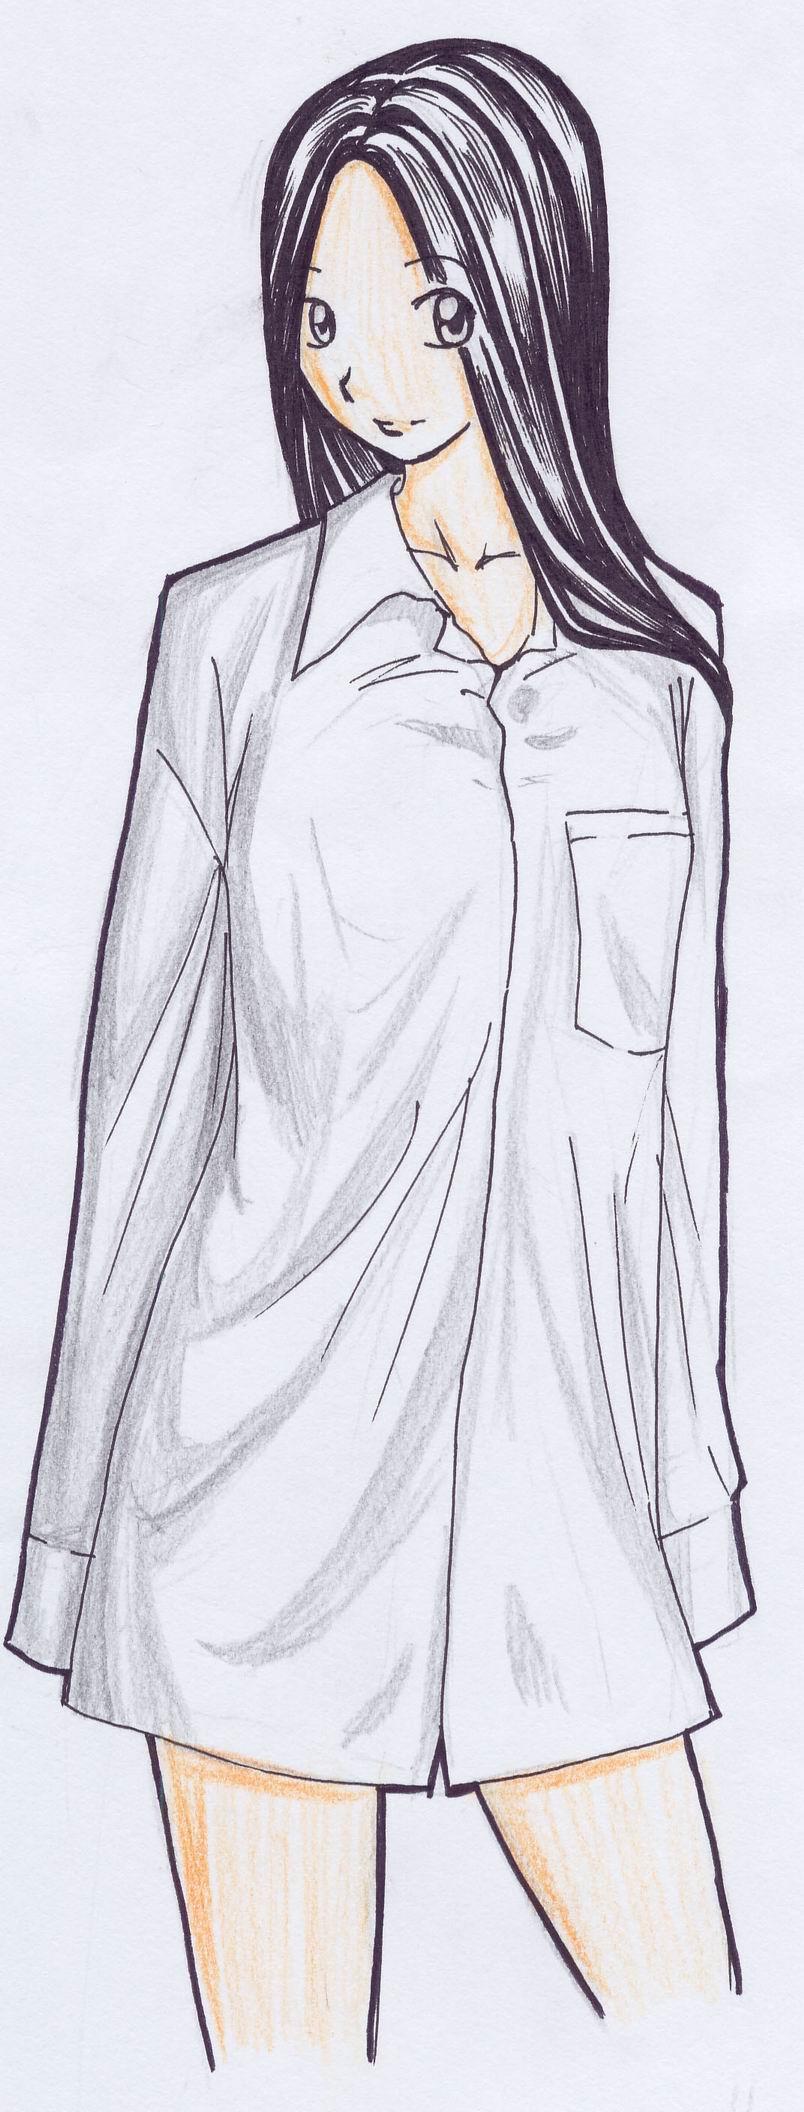 girl in shirt by teruterubozu849